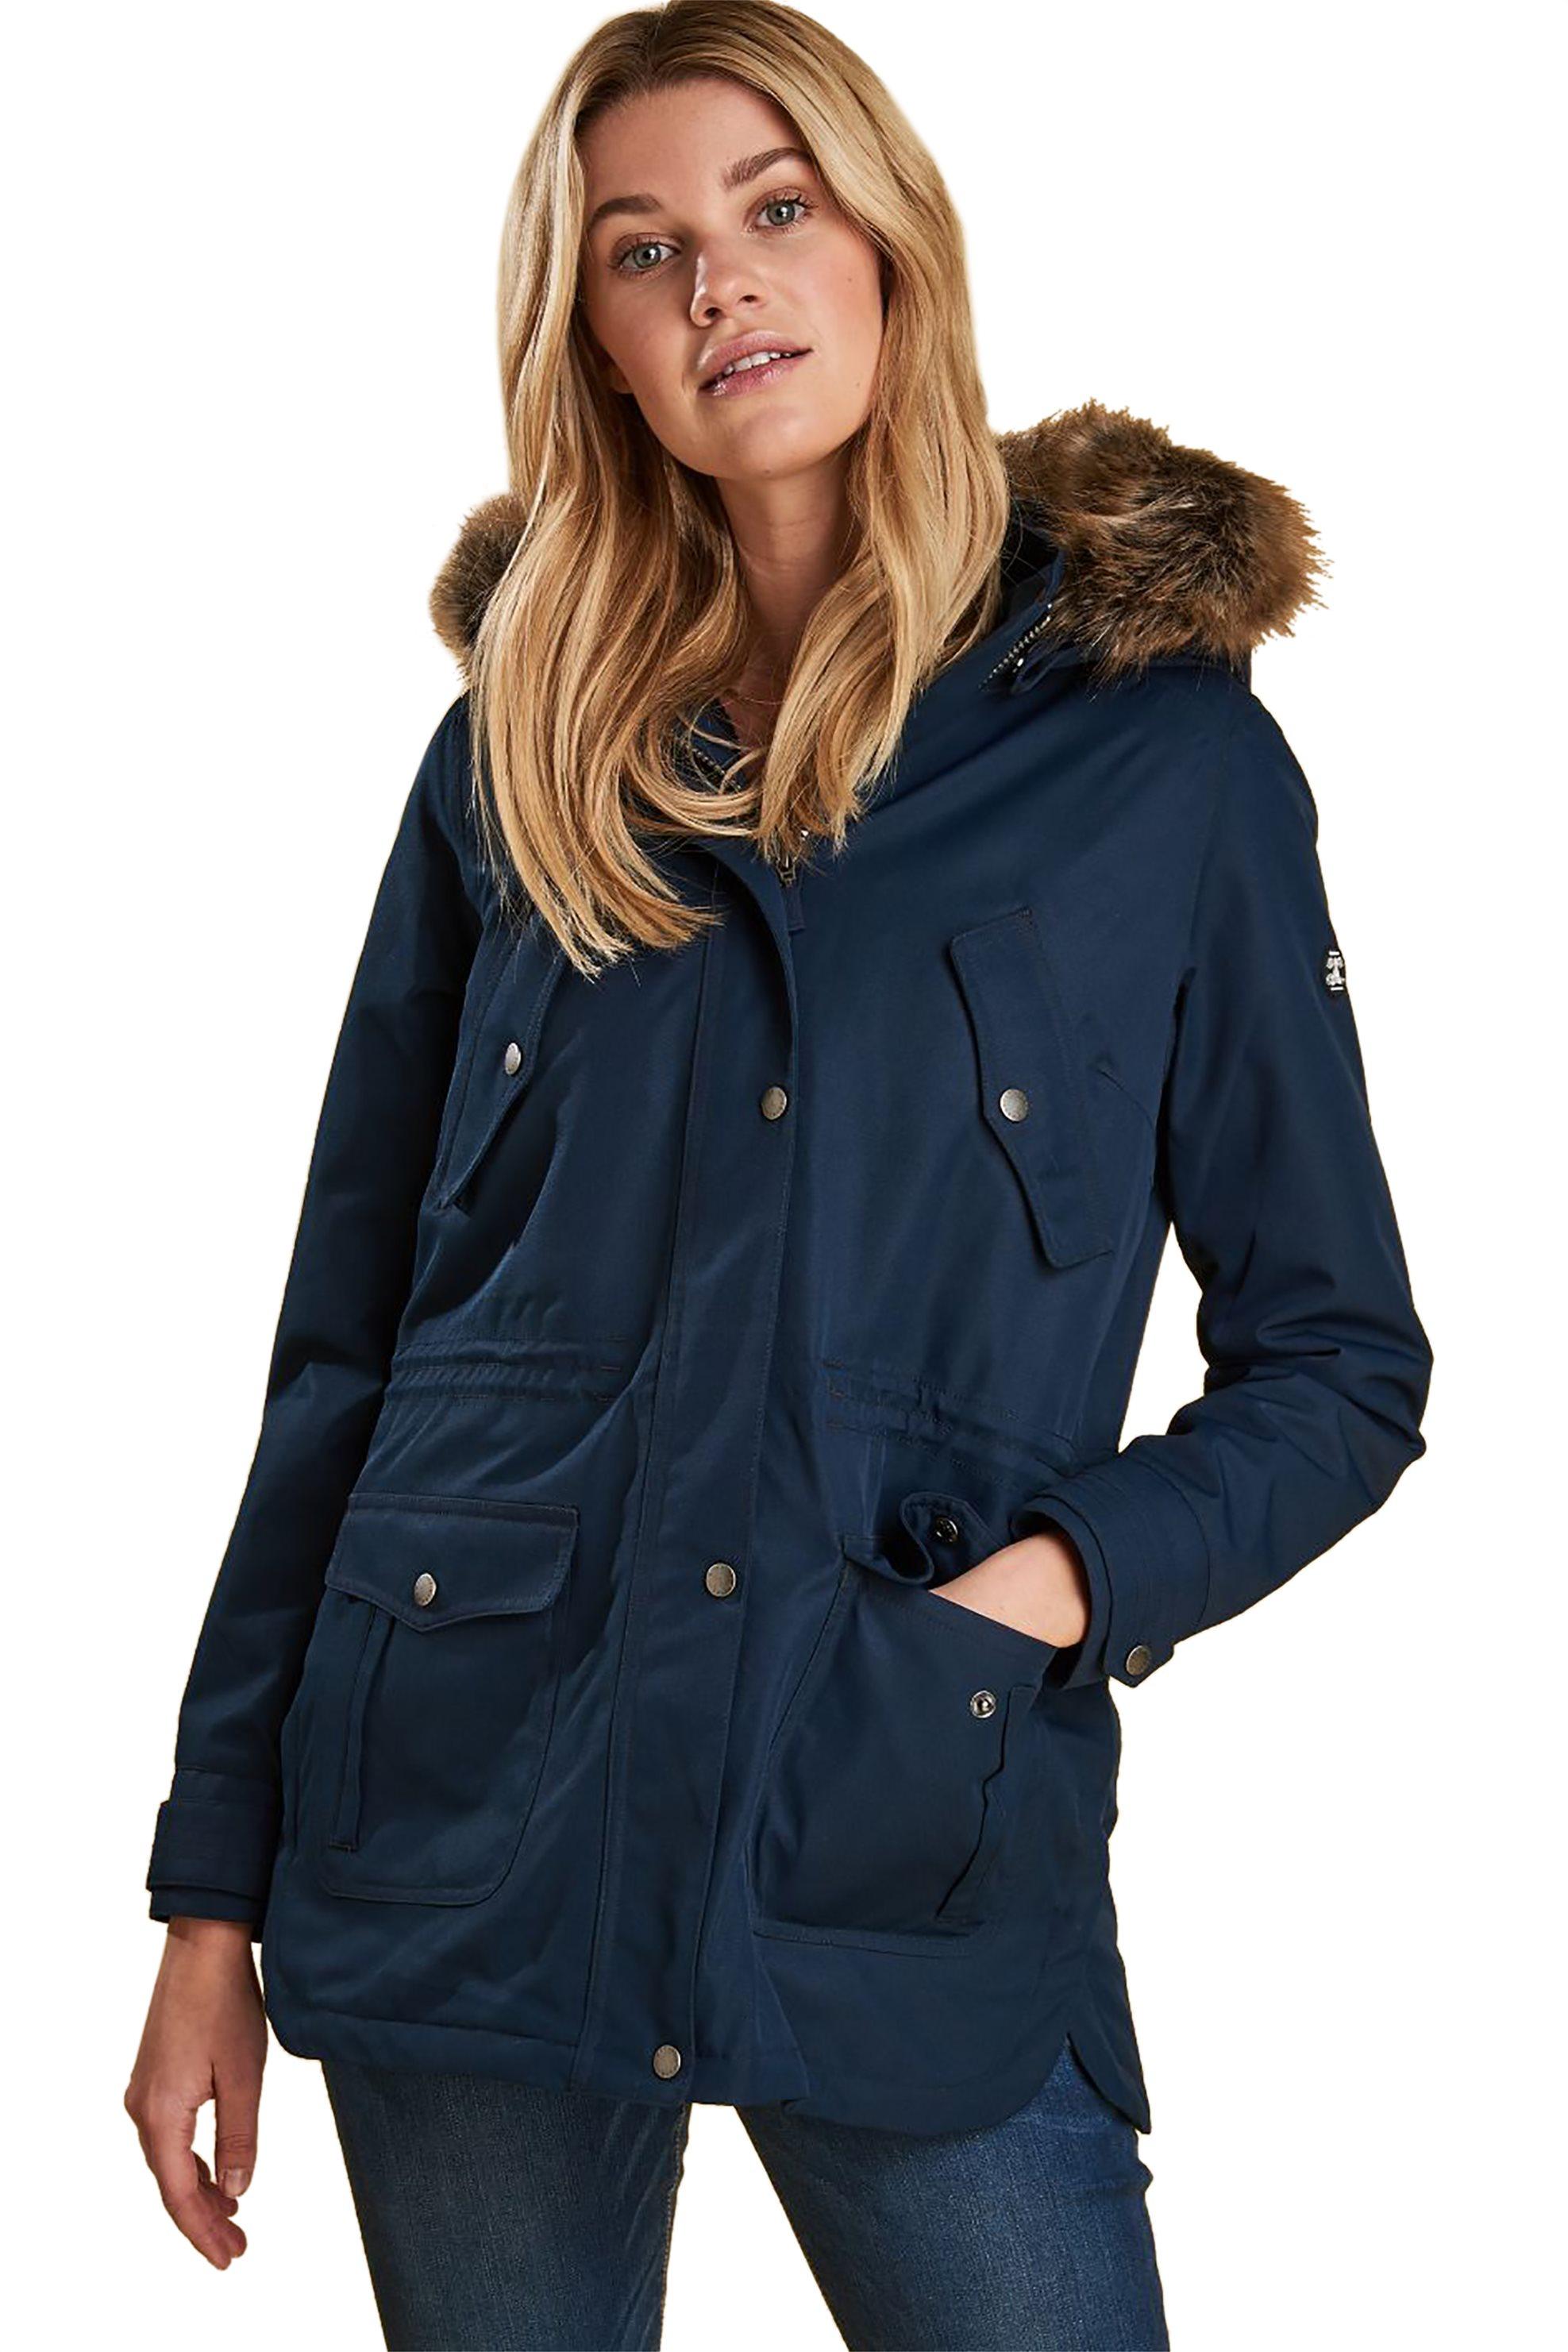 31096d6293f Barbour γυναικείο αδιάβροχο μπουφάν με κουκούλα - LWB0486 - Μπλε Σκούρο